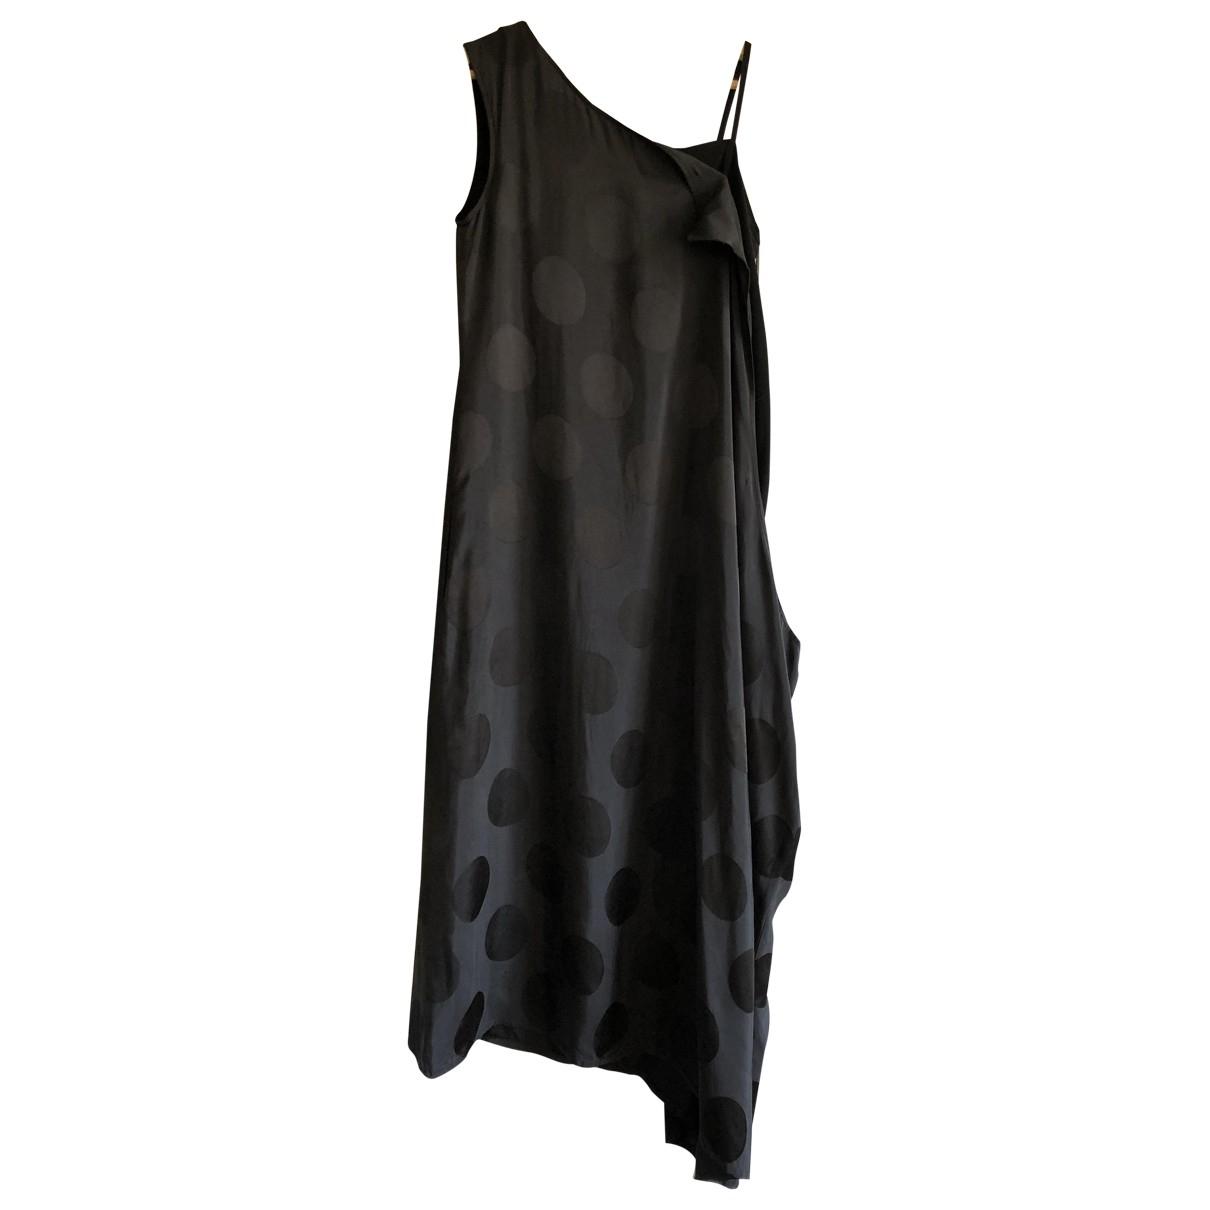 Yohji Yamamoto \N Black Silk dress for Women 1 0-5